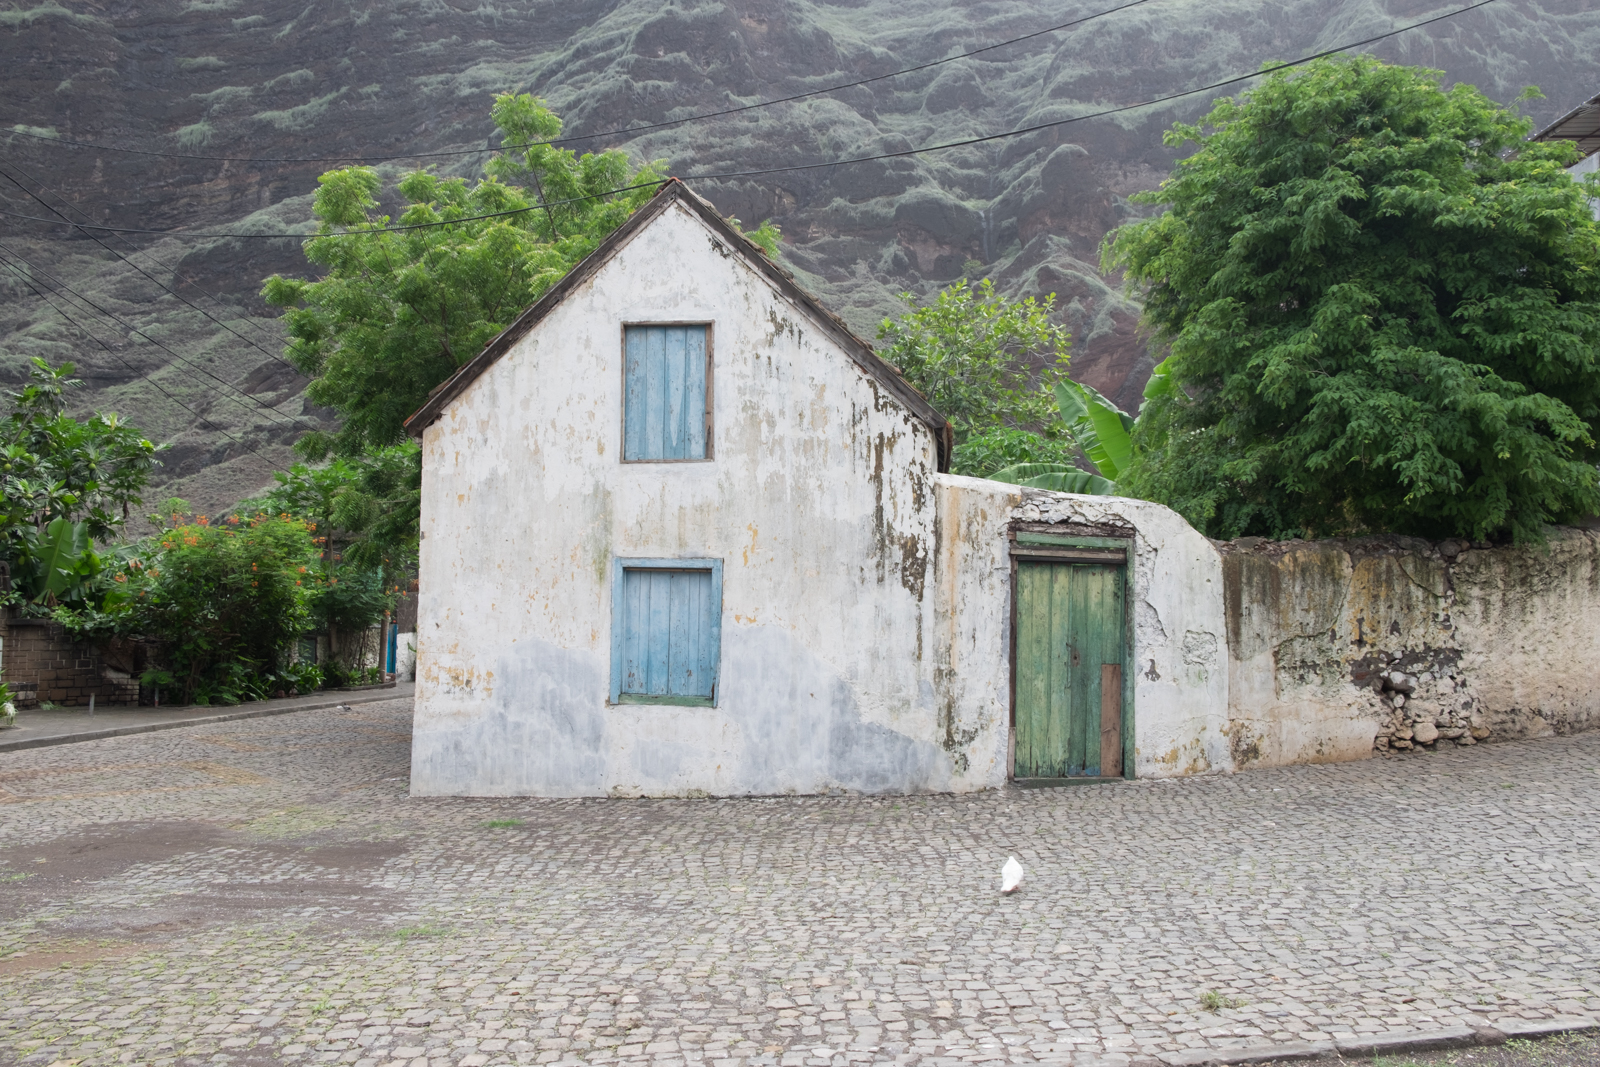 DSCF0184 - It never rains on Cabo Verde